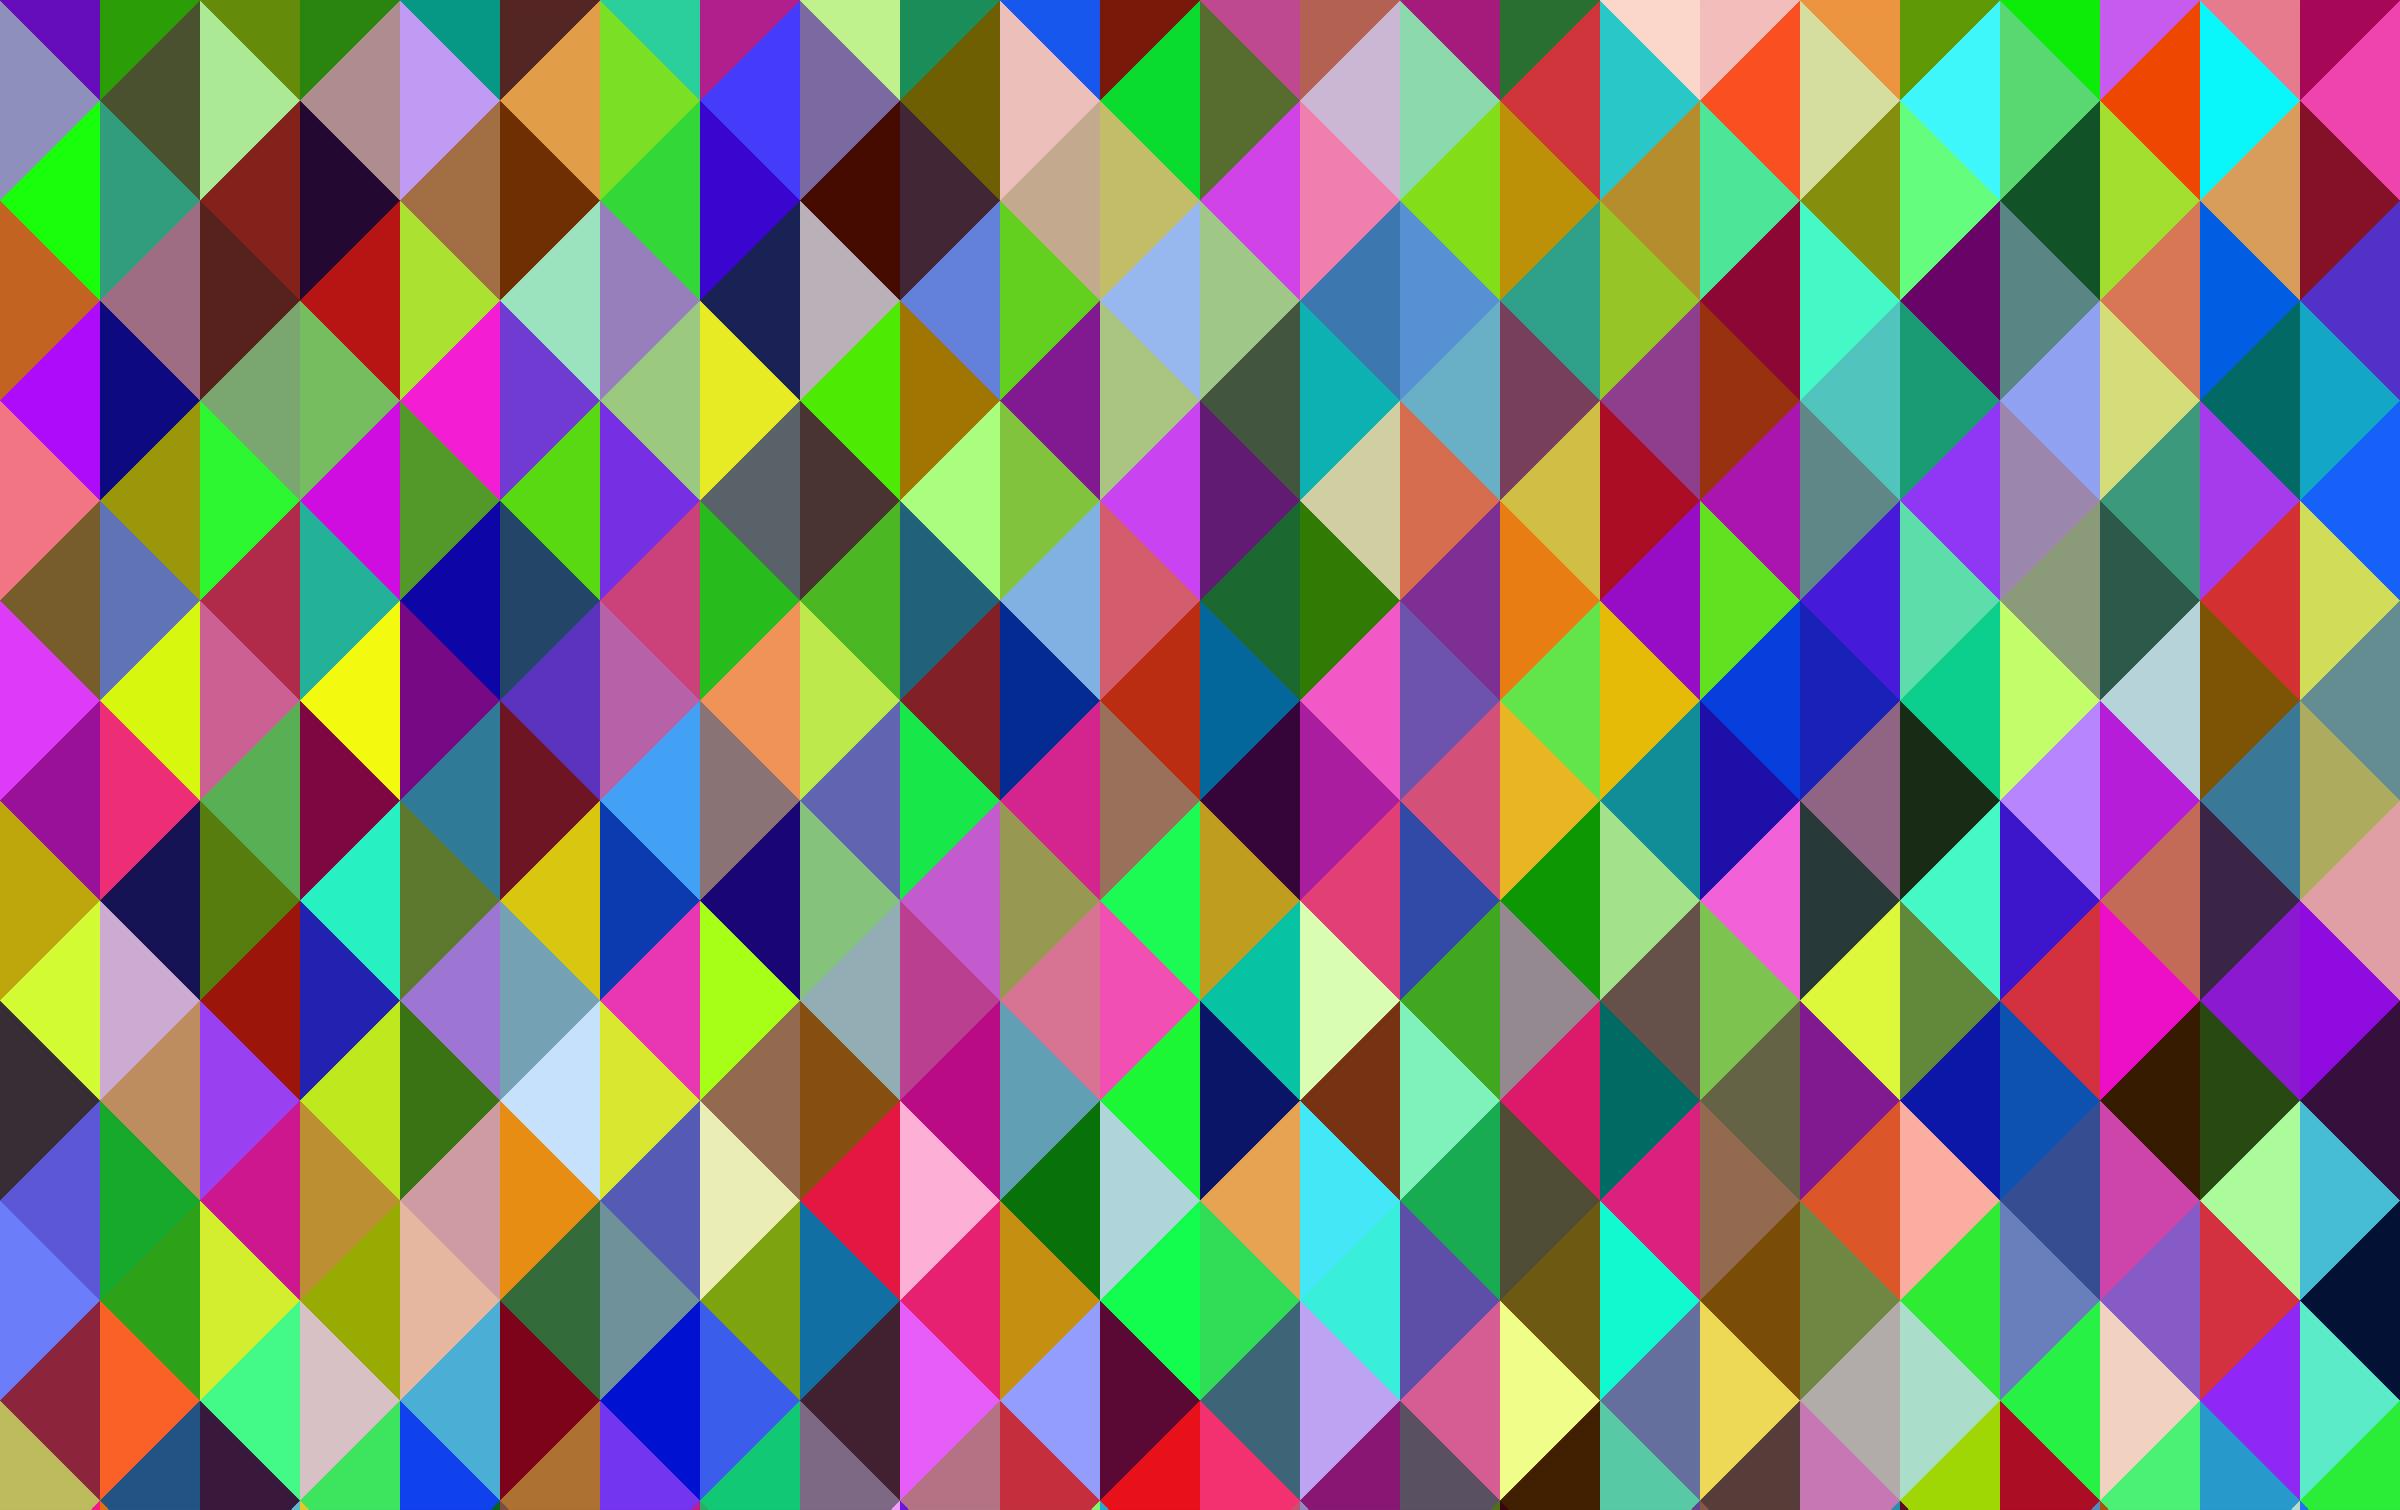 clipart prismatic triangular background design mark ii clip art rainbow pictures clip art rainbow tree